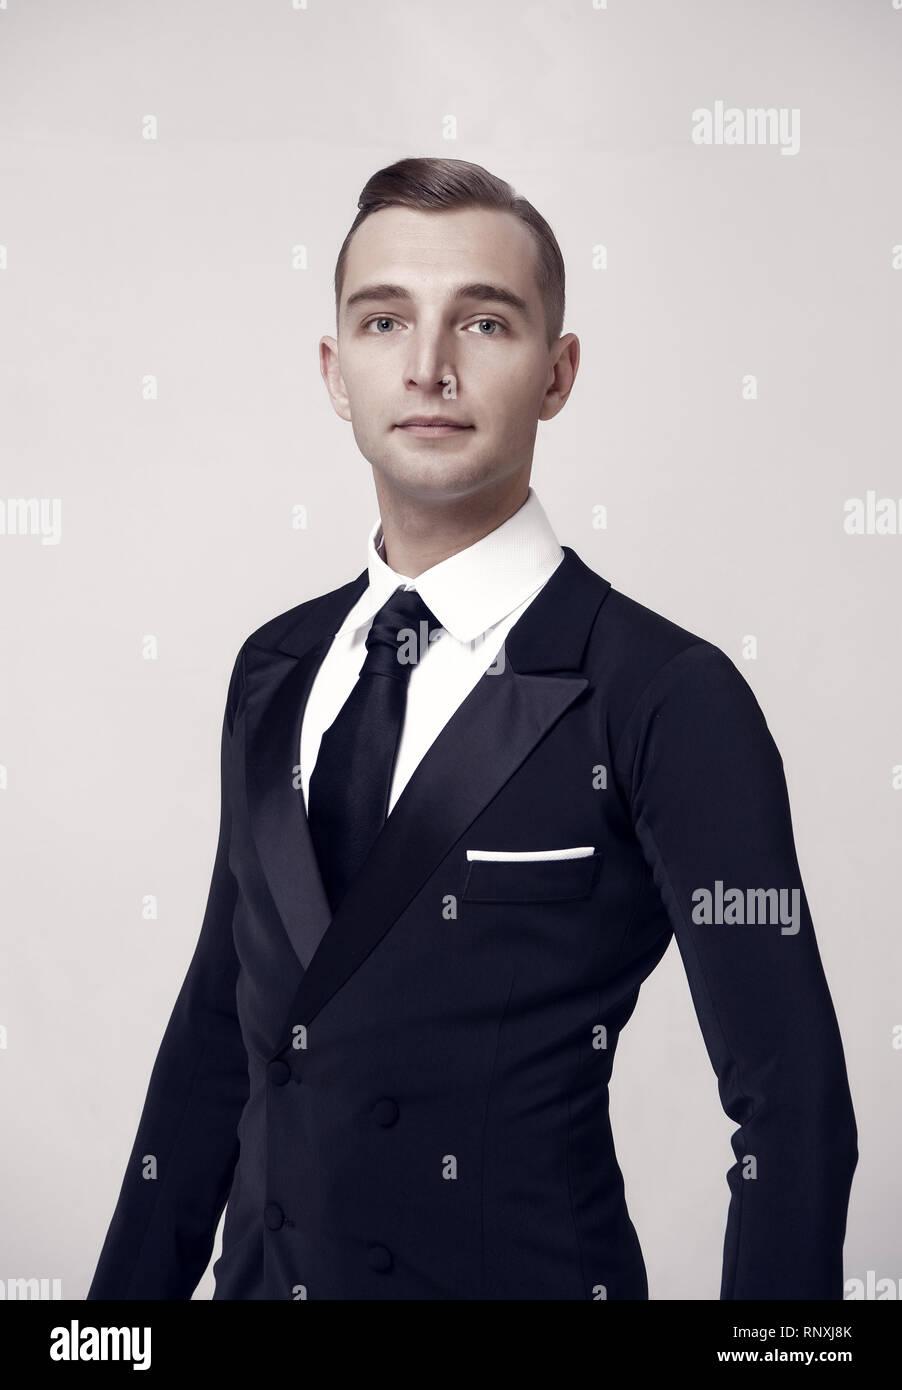 Matrimonio Elegante Uomo : La sala da ballo ballerino in elegante smoking uomo in abito